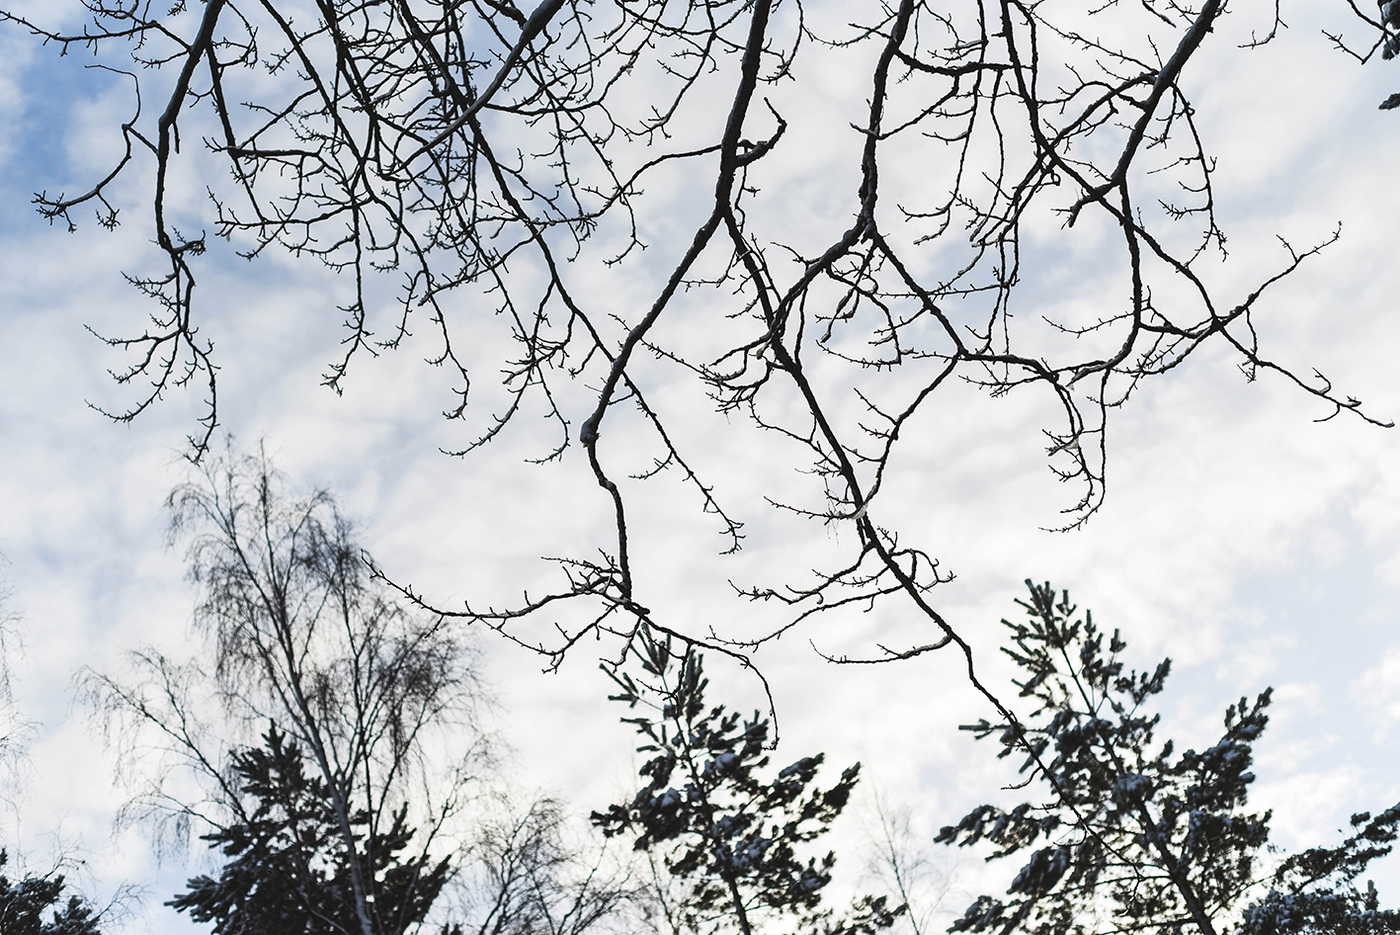 suomi100-itsenaisyyspaiva-sundayblondie-5.jpg